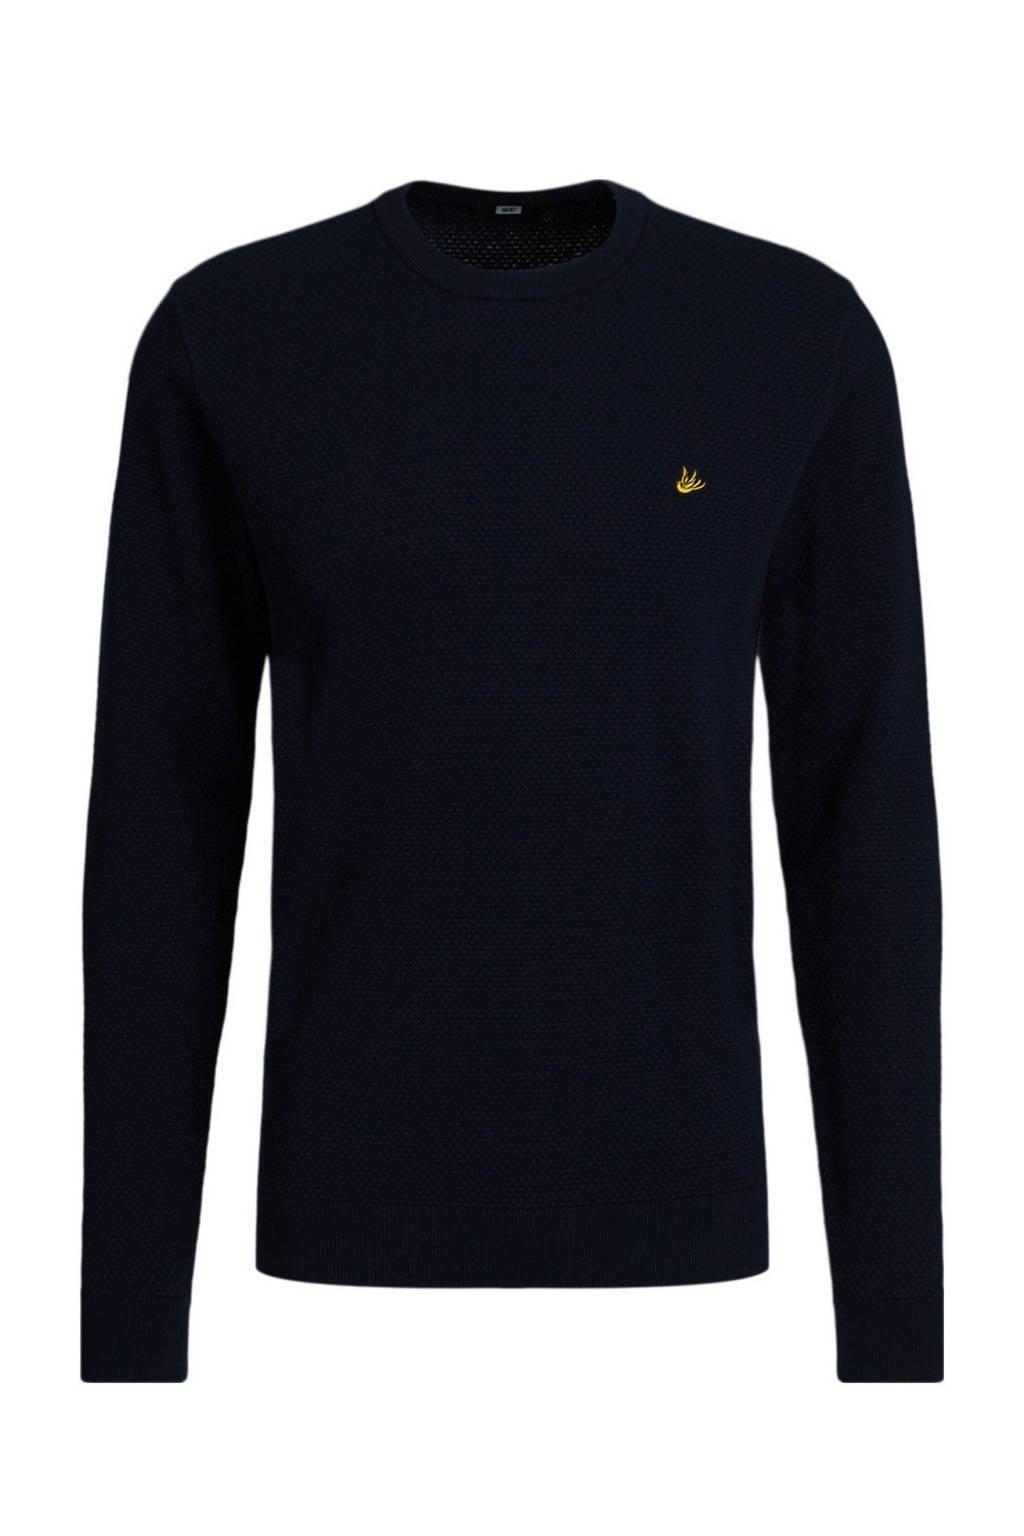 WE Fashion Fundamentals trui donkerblauw, Donkerblauw